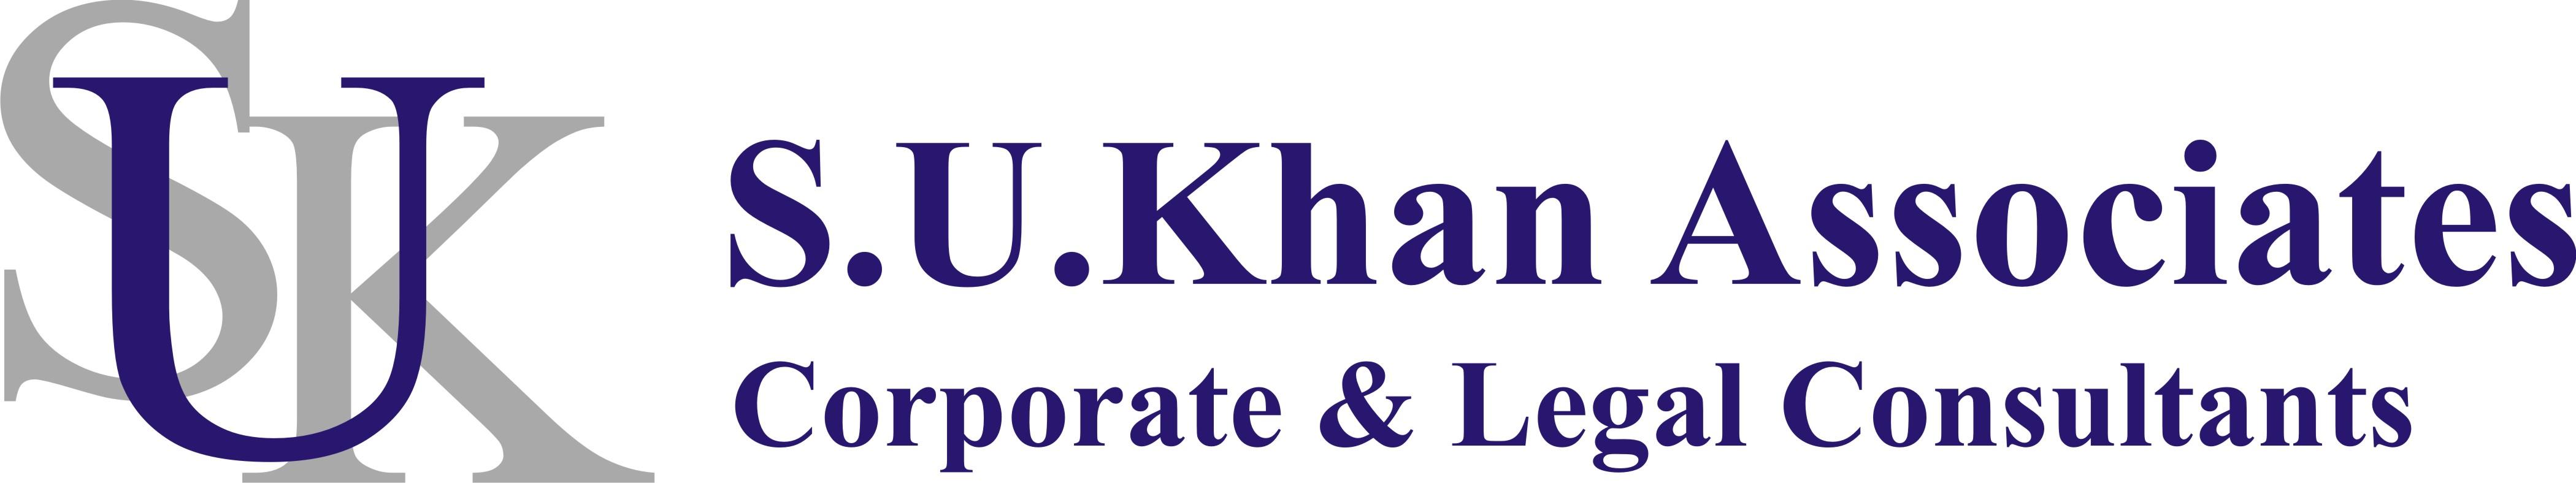 S.U.Khan Associates Corporate & Legal Consultants logo